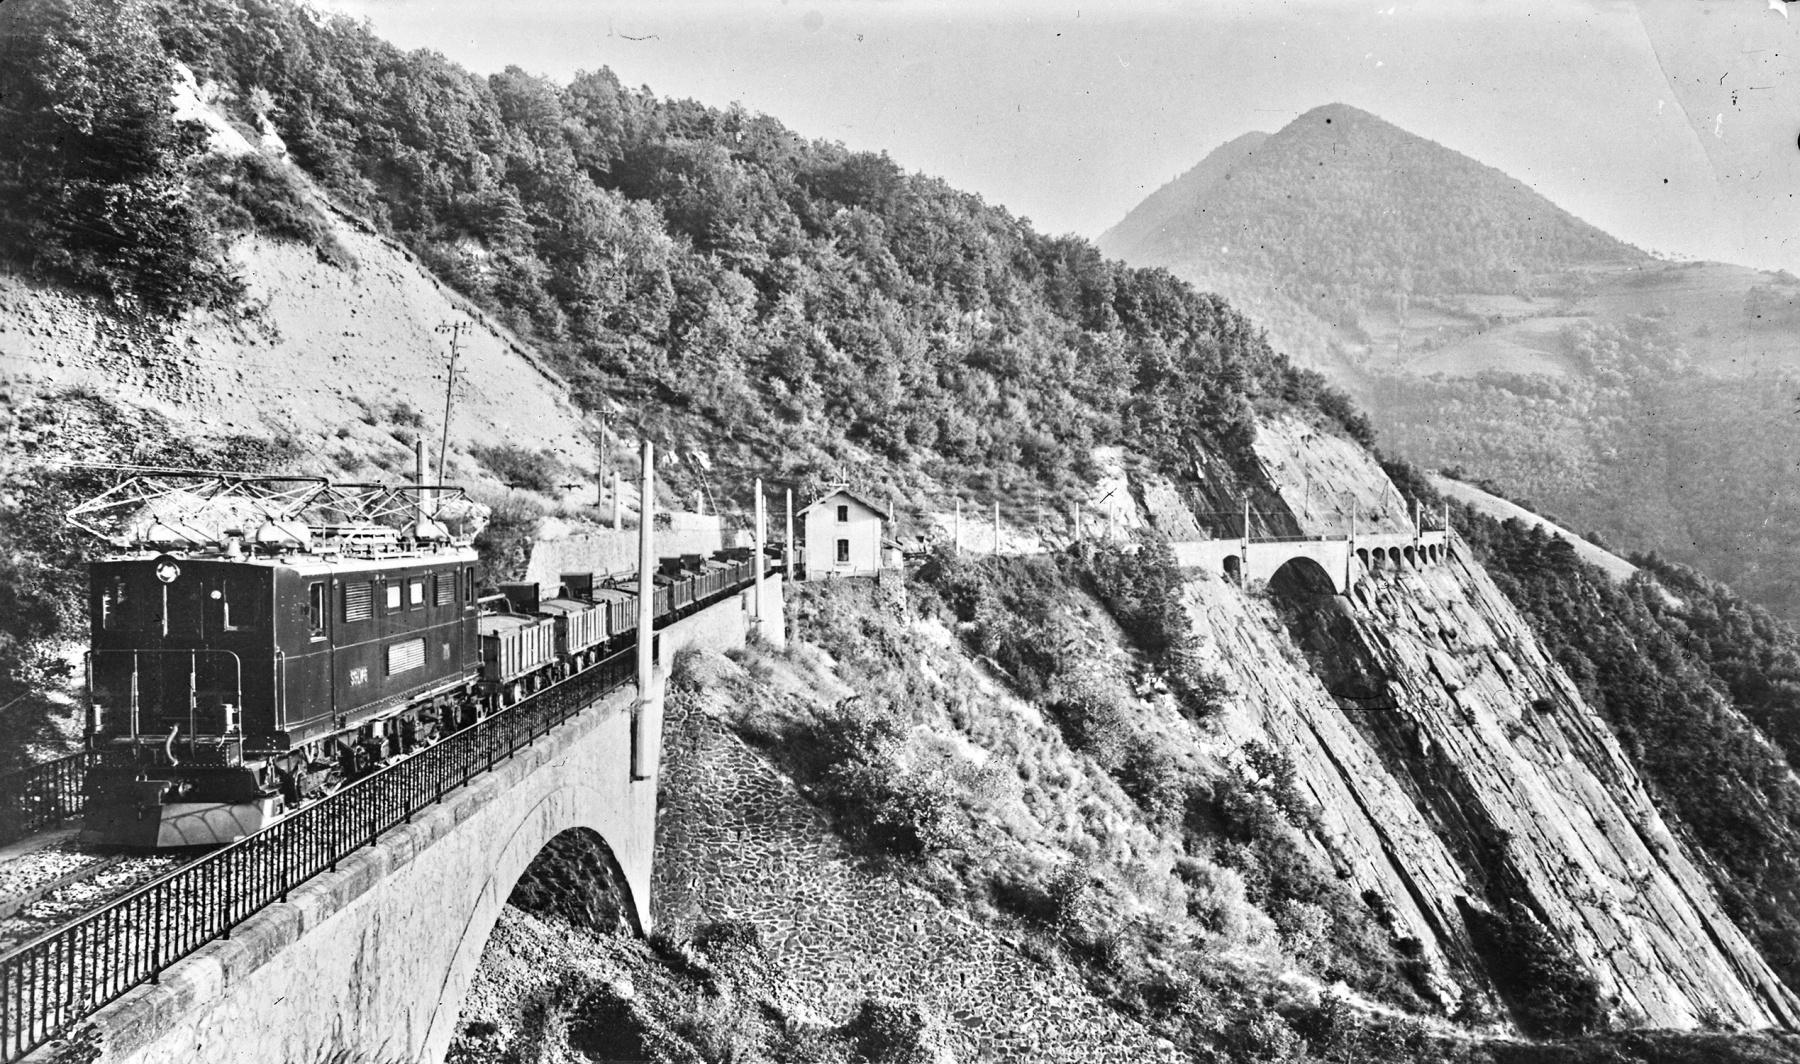 train-de-la-mure-rivoire-iseremag%C2%A9M.Dauphinoisjpg.jpg